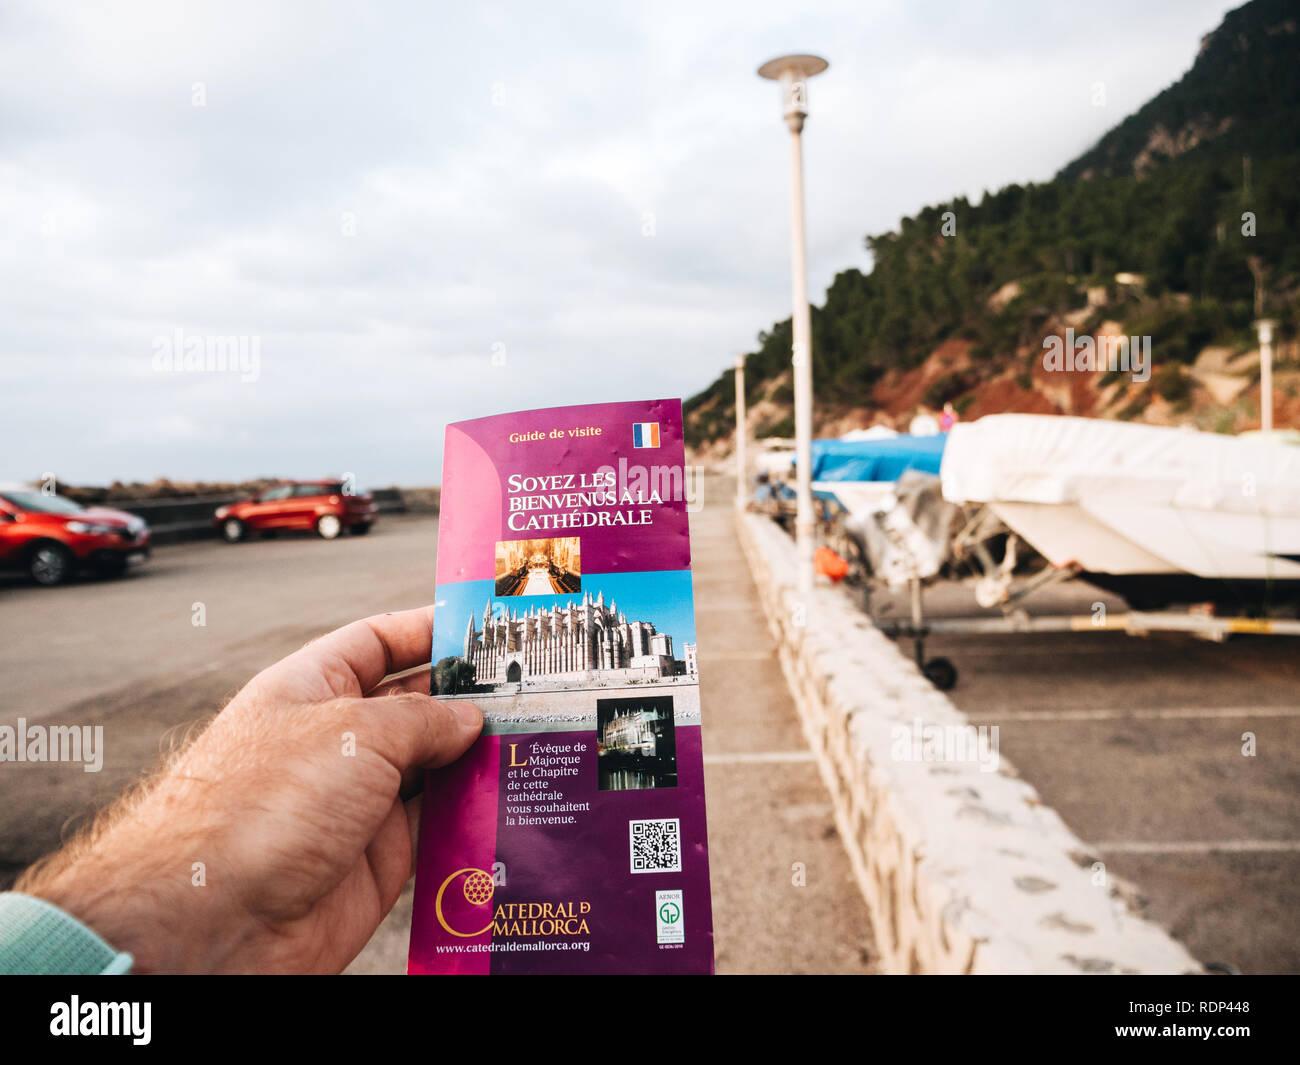 Port de Valldemosa, Palma de Malloca, Spain - May 10, 2018: Man holding pov the touristic guide of the Santa Maria of Palma Cathedral in the parking of Port de Valldemosa Stock Photo